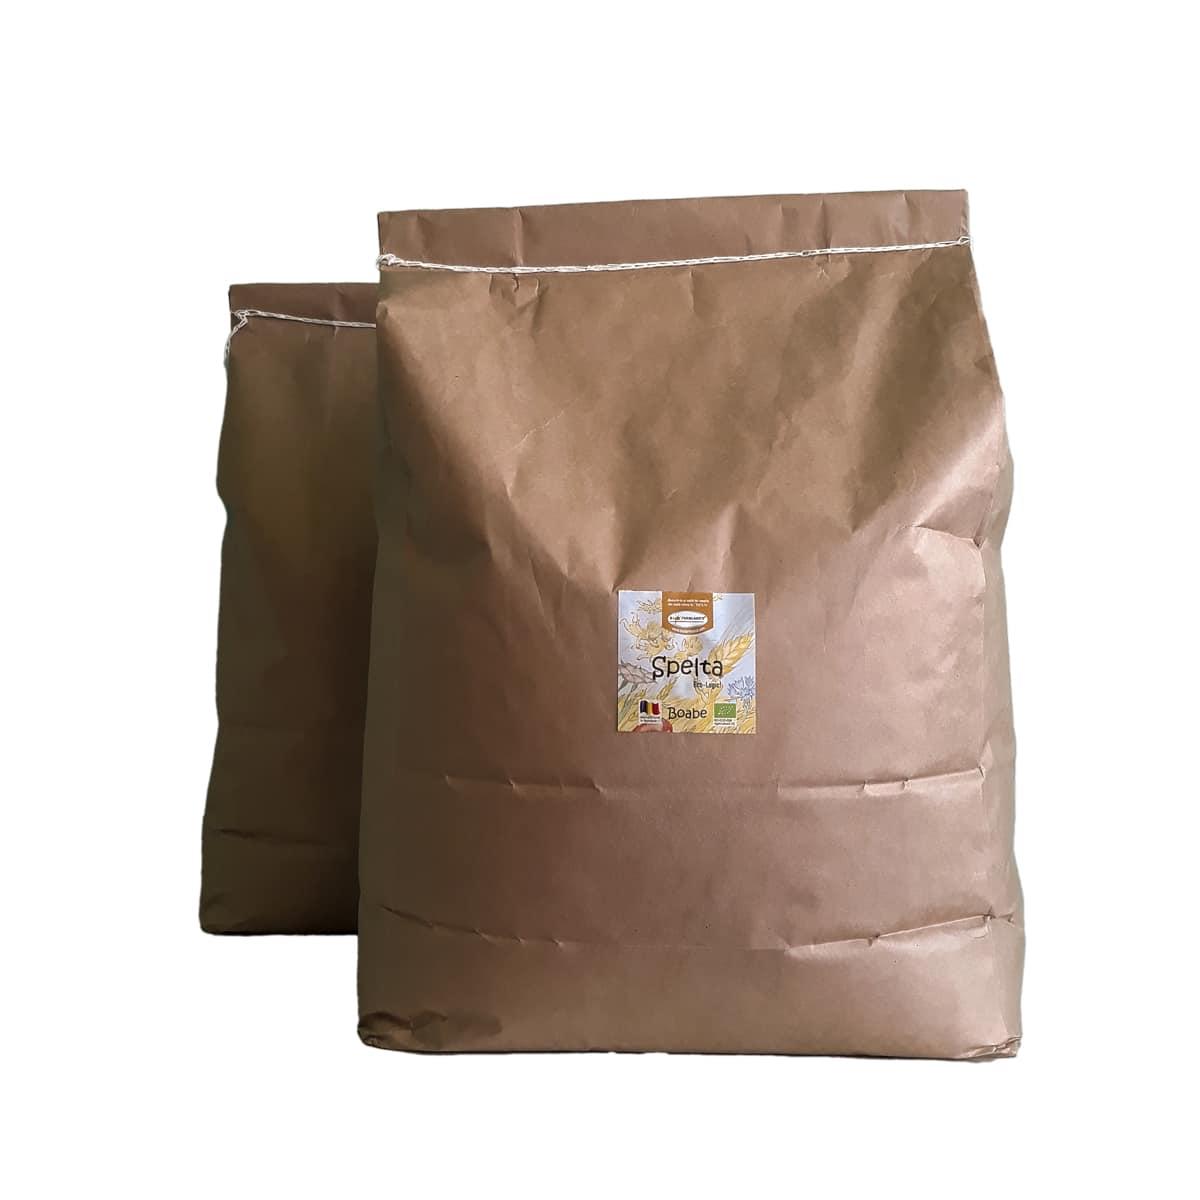 Boabe Spelta ecologice - 40 kg